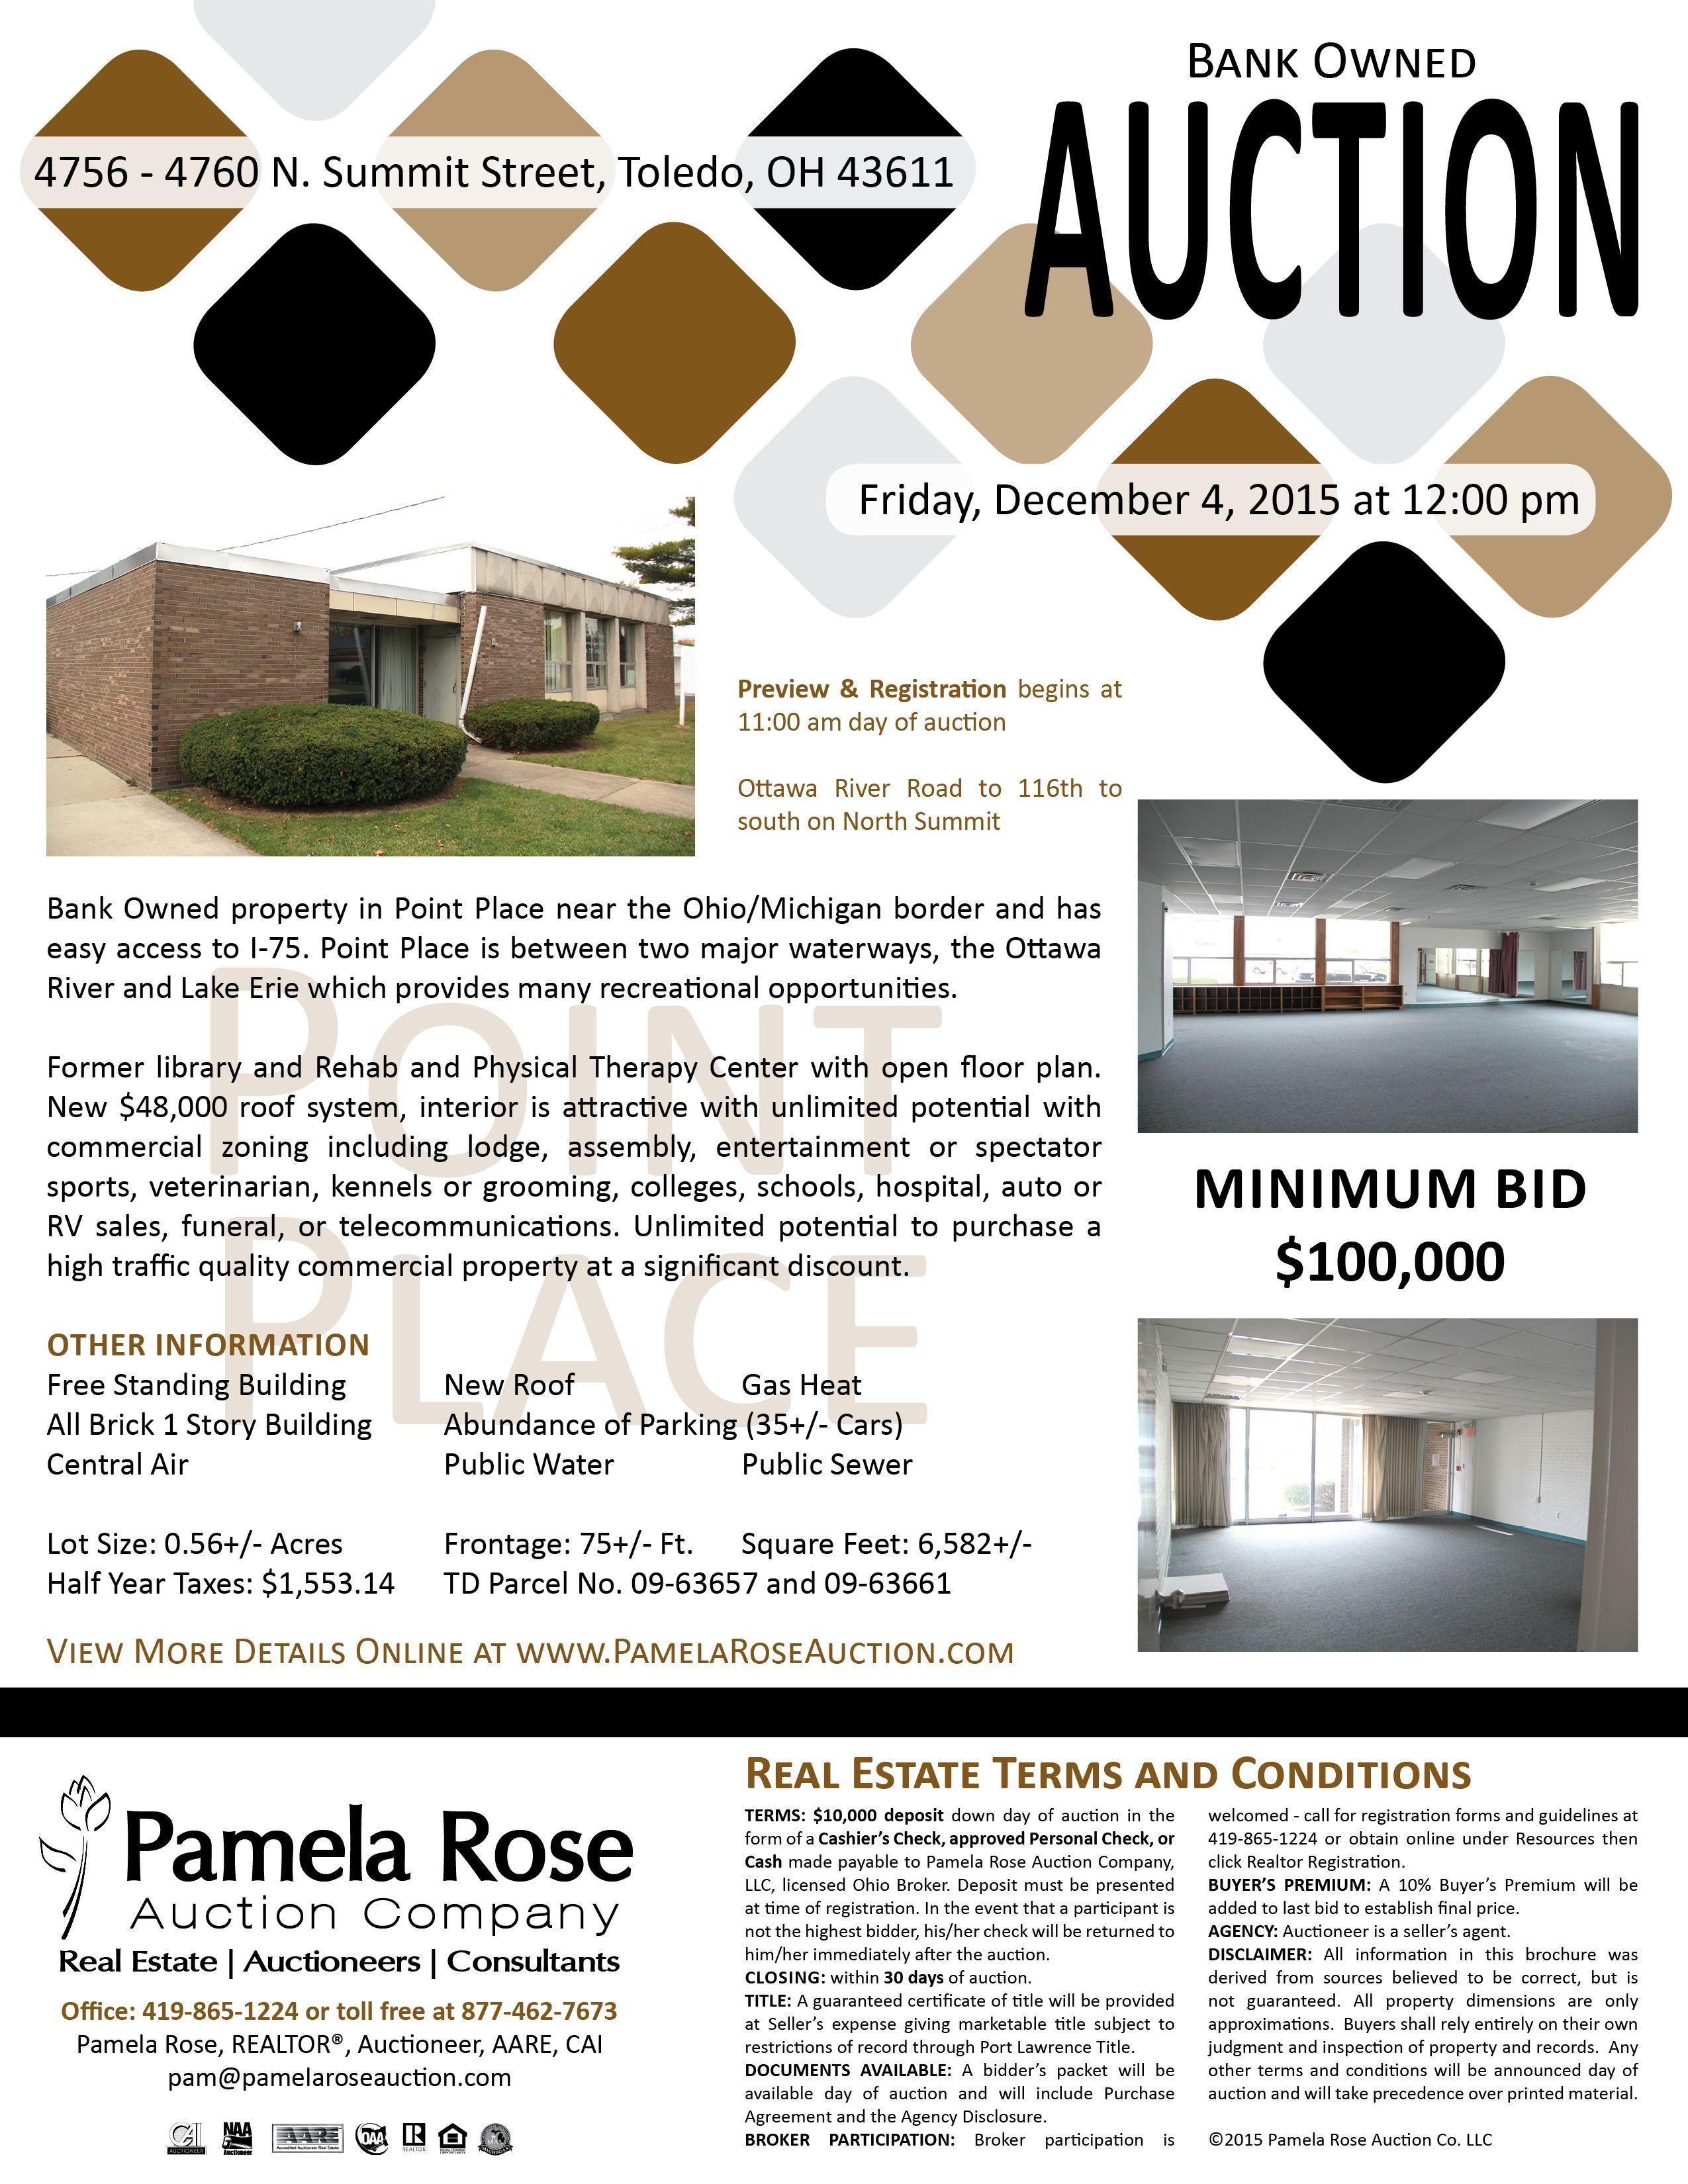 Bank owned auction minimum bid 100000 at 47564760 n